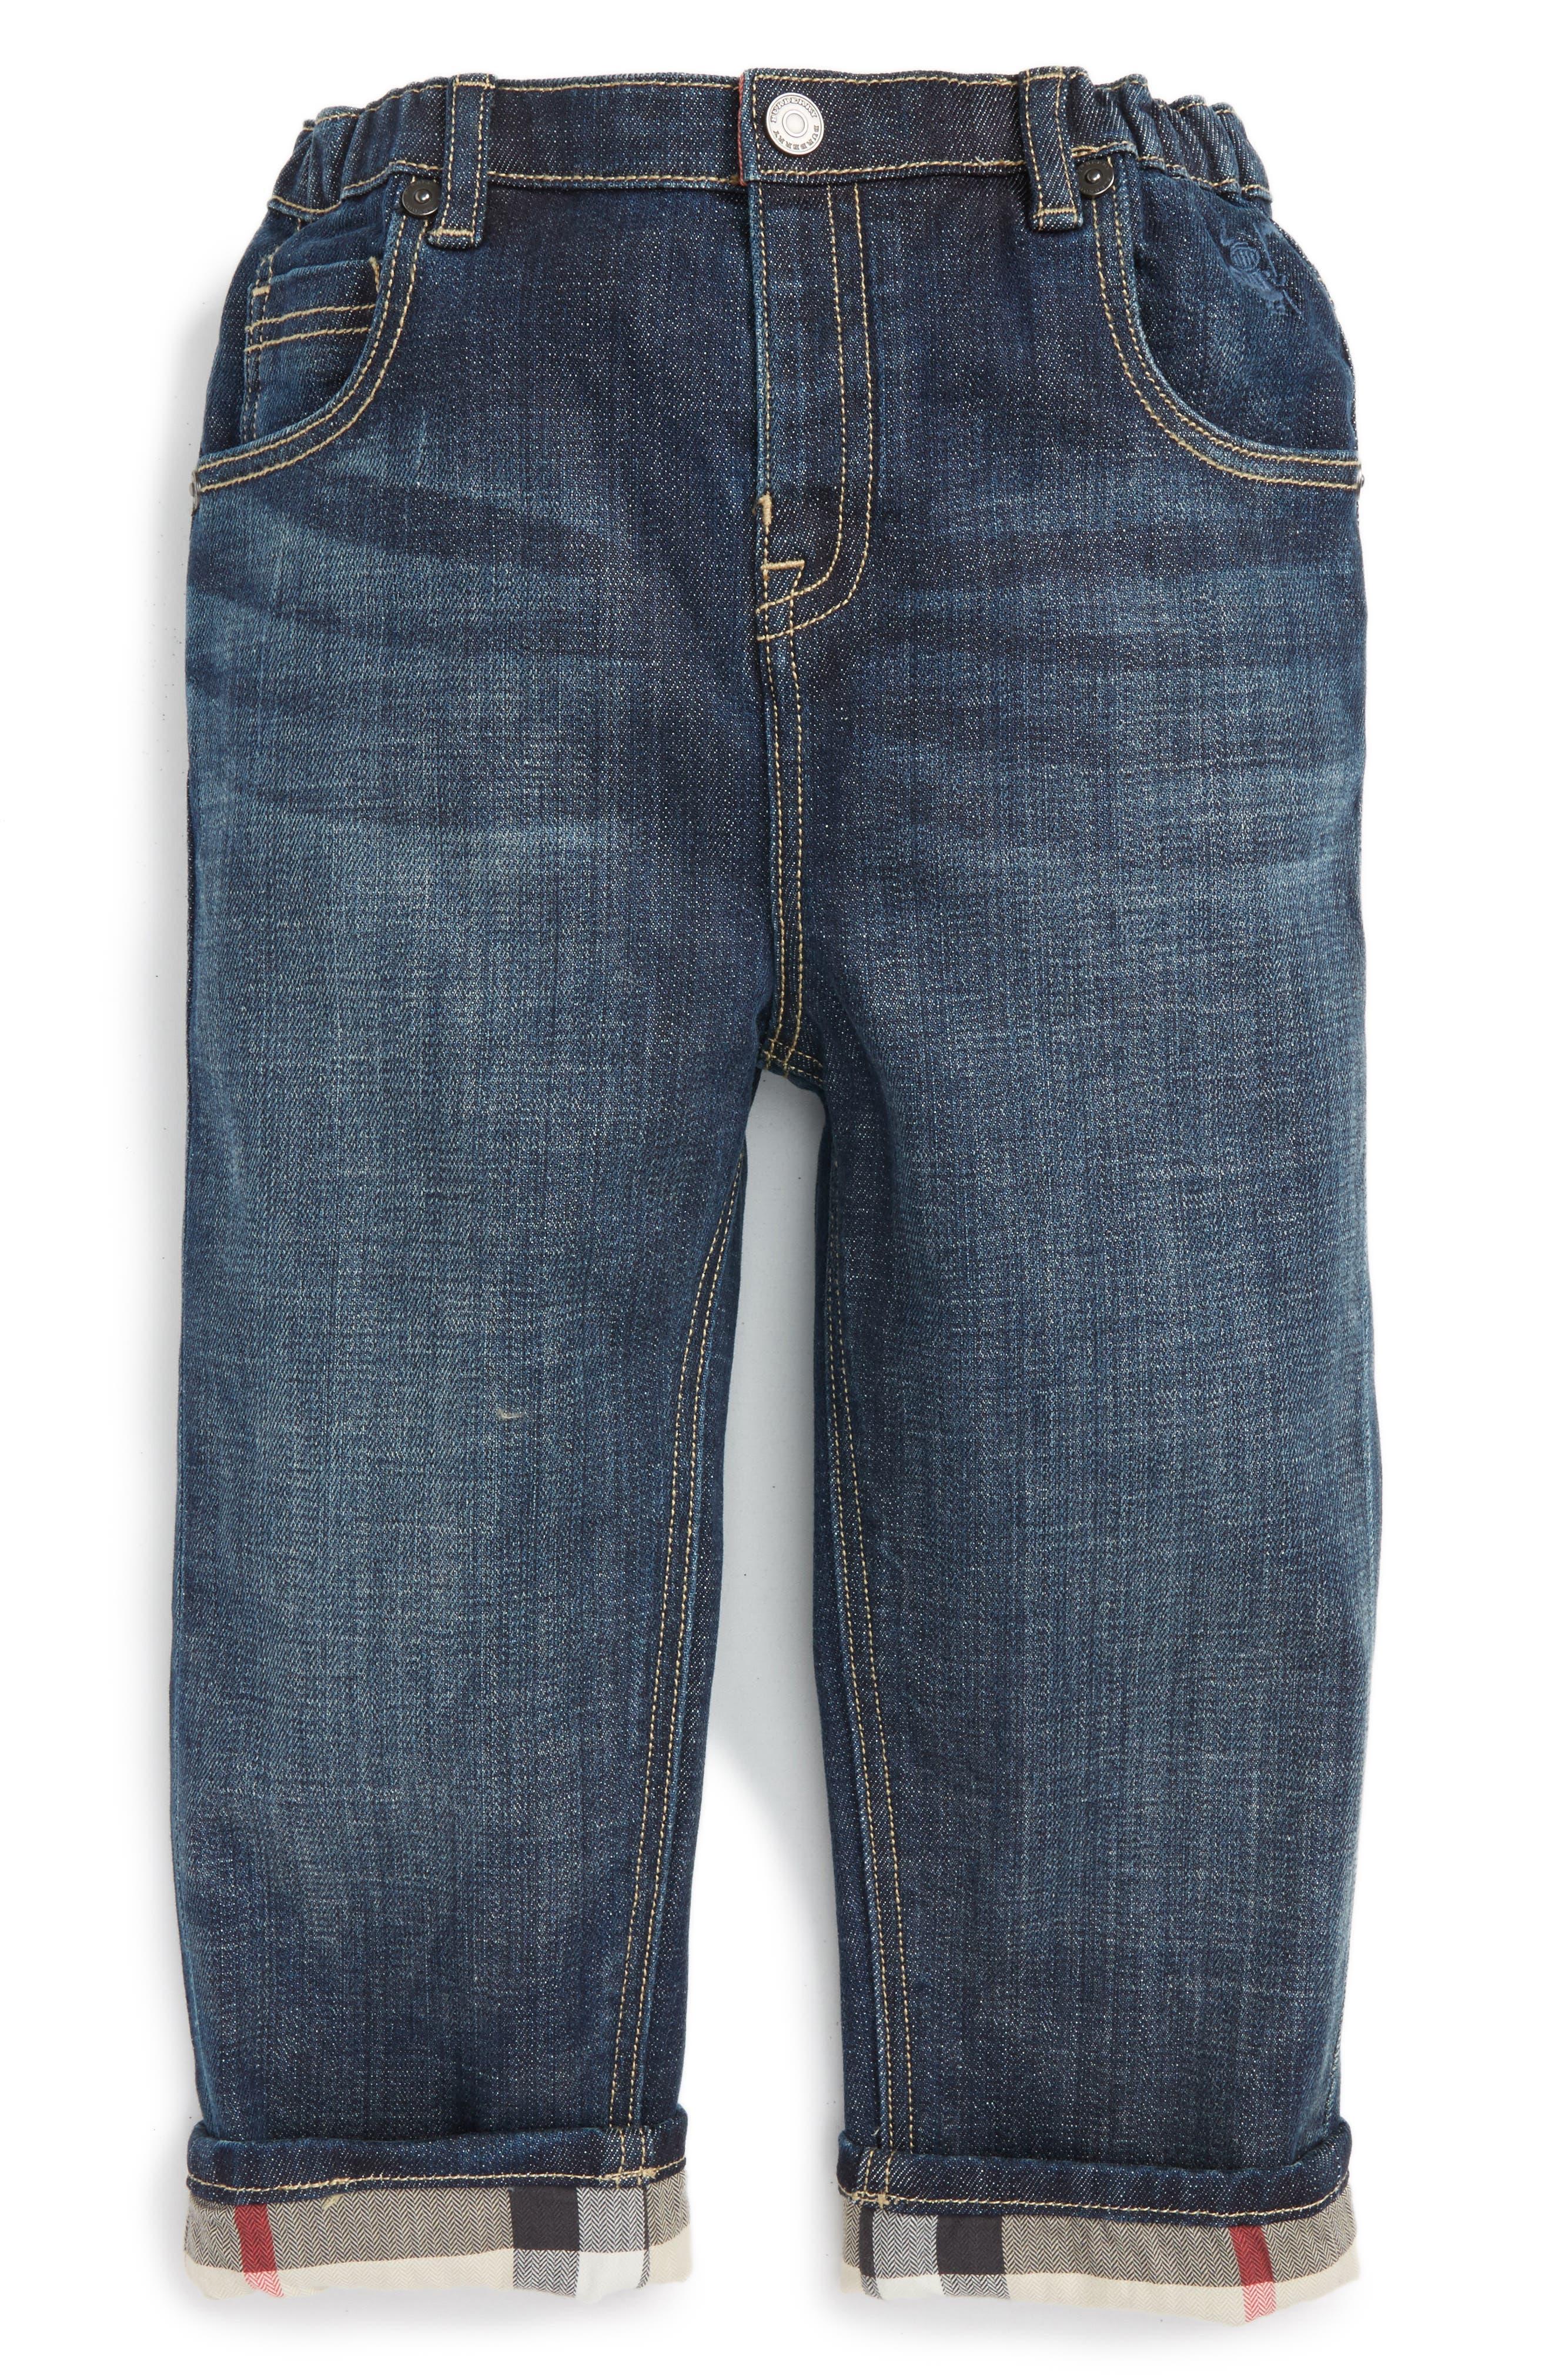 Main Image - Burberry Pierre Straight Leg Jeans (Toddler Boys)